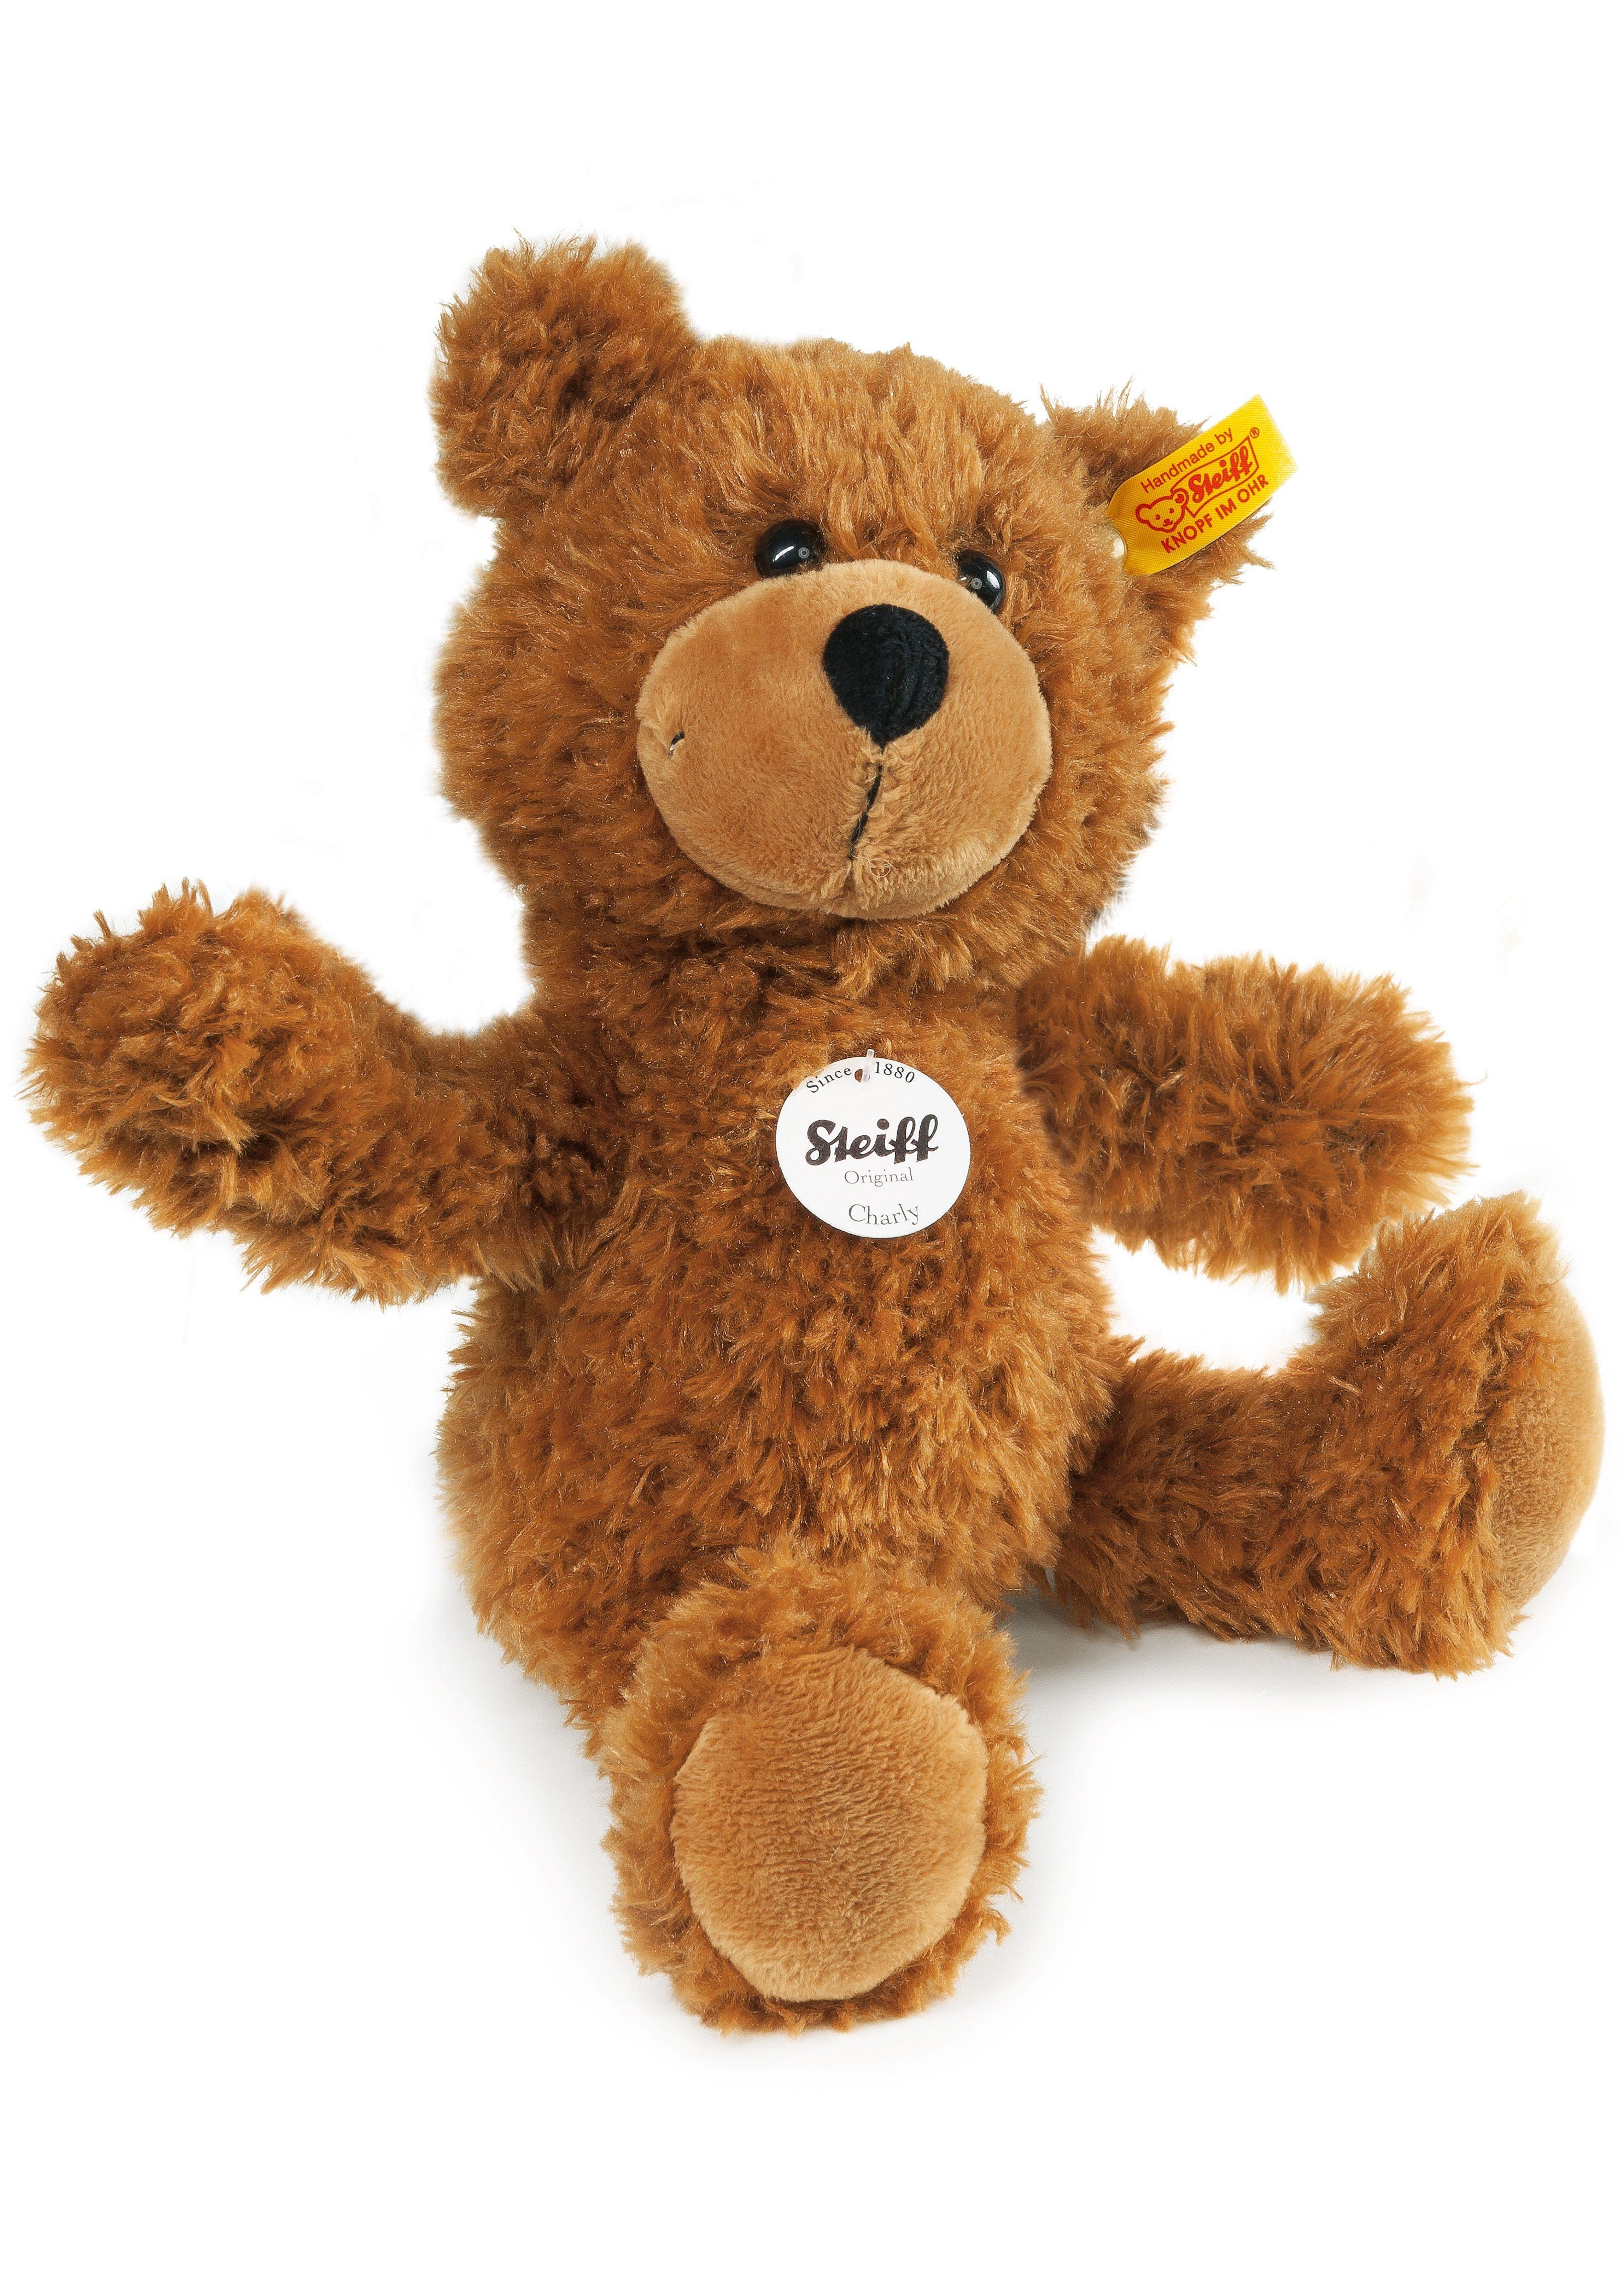 Steiff Plüschtier, »Charly Schlenker-Teddybär«